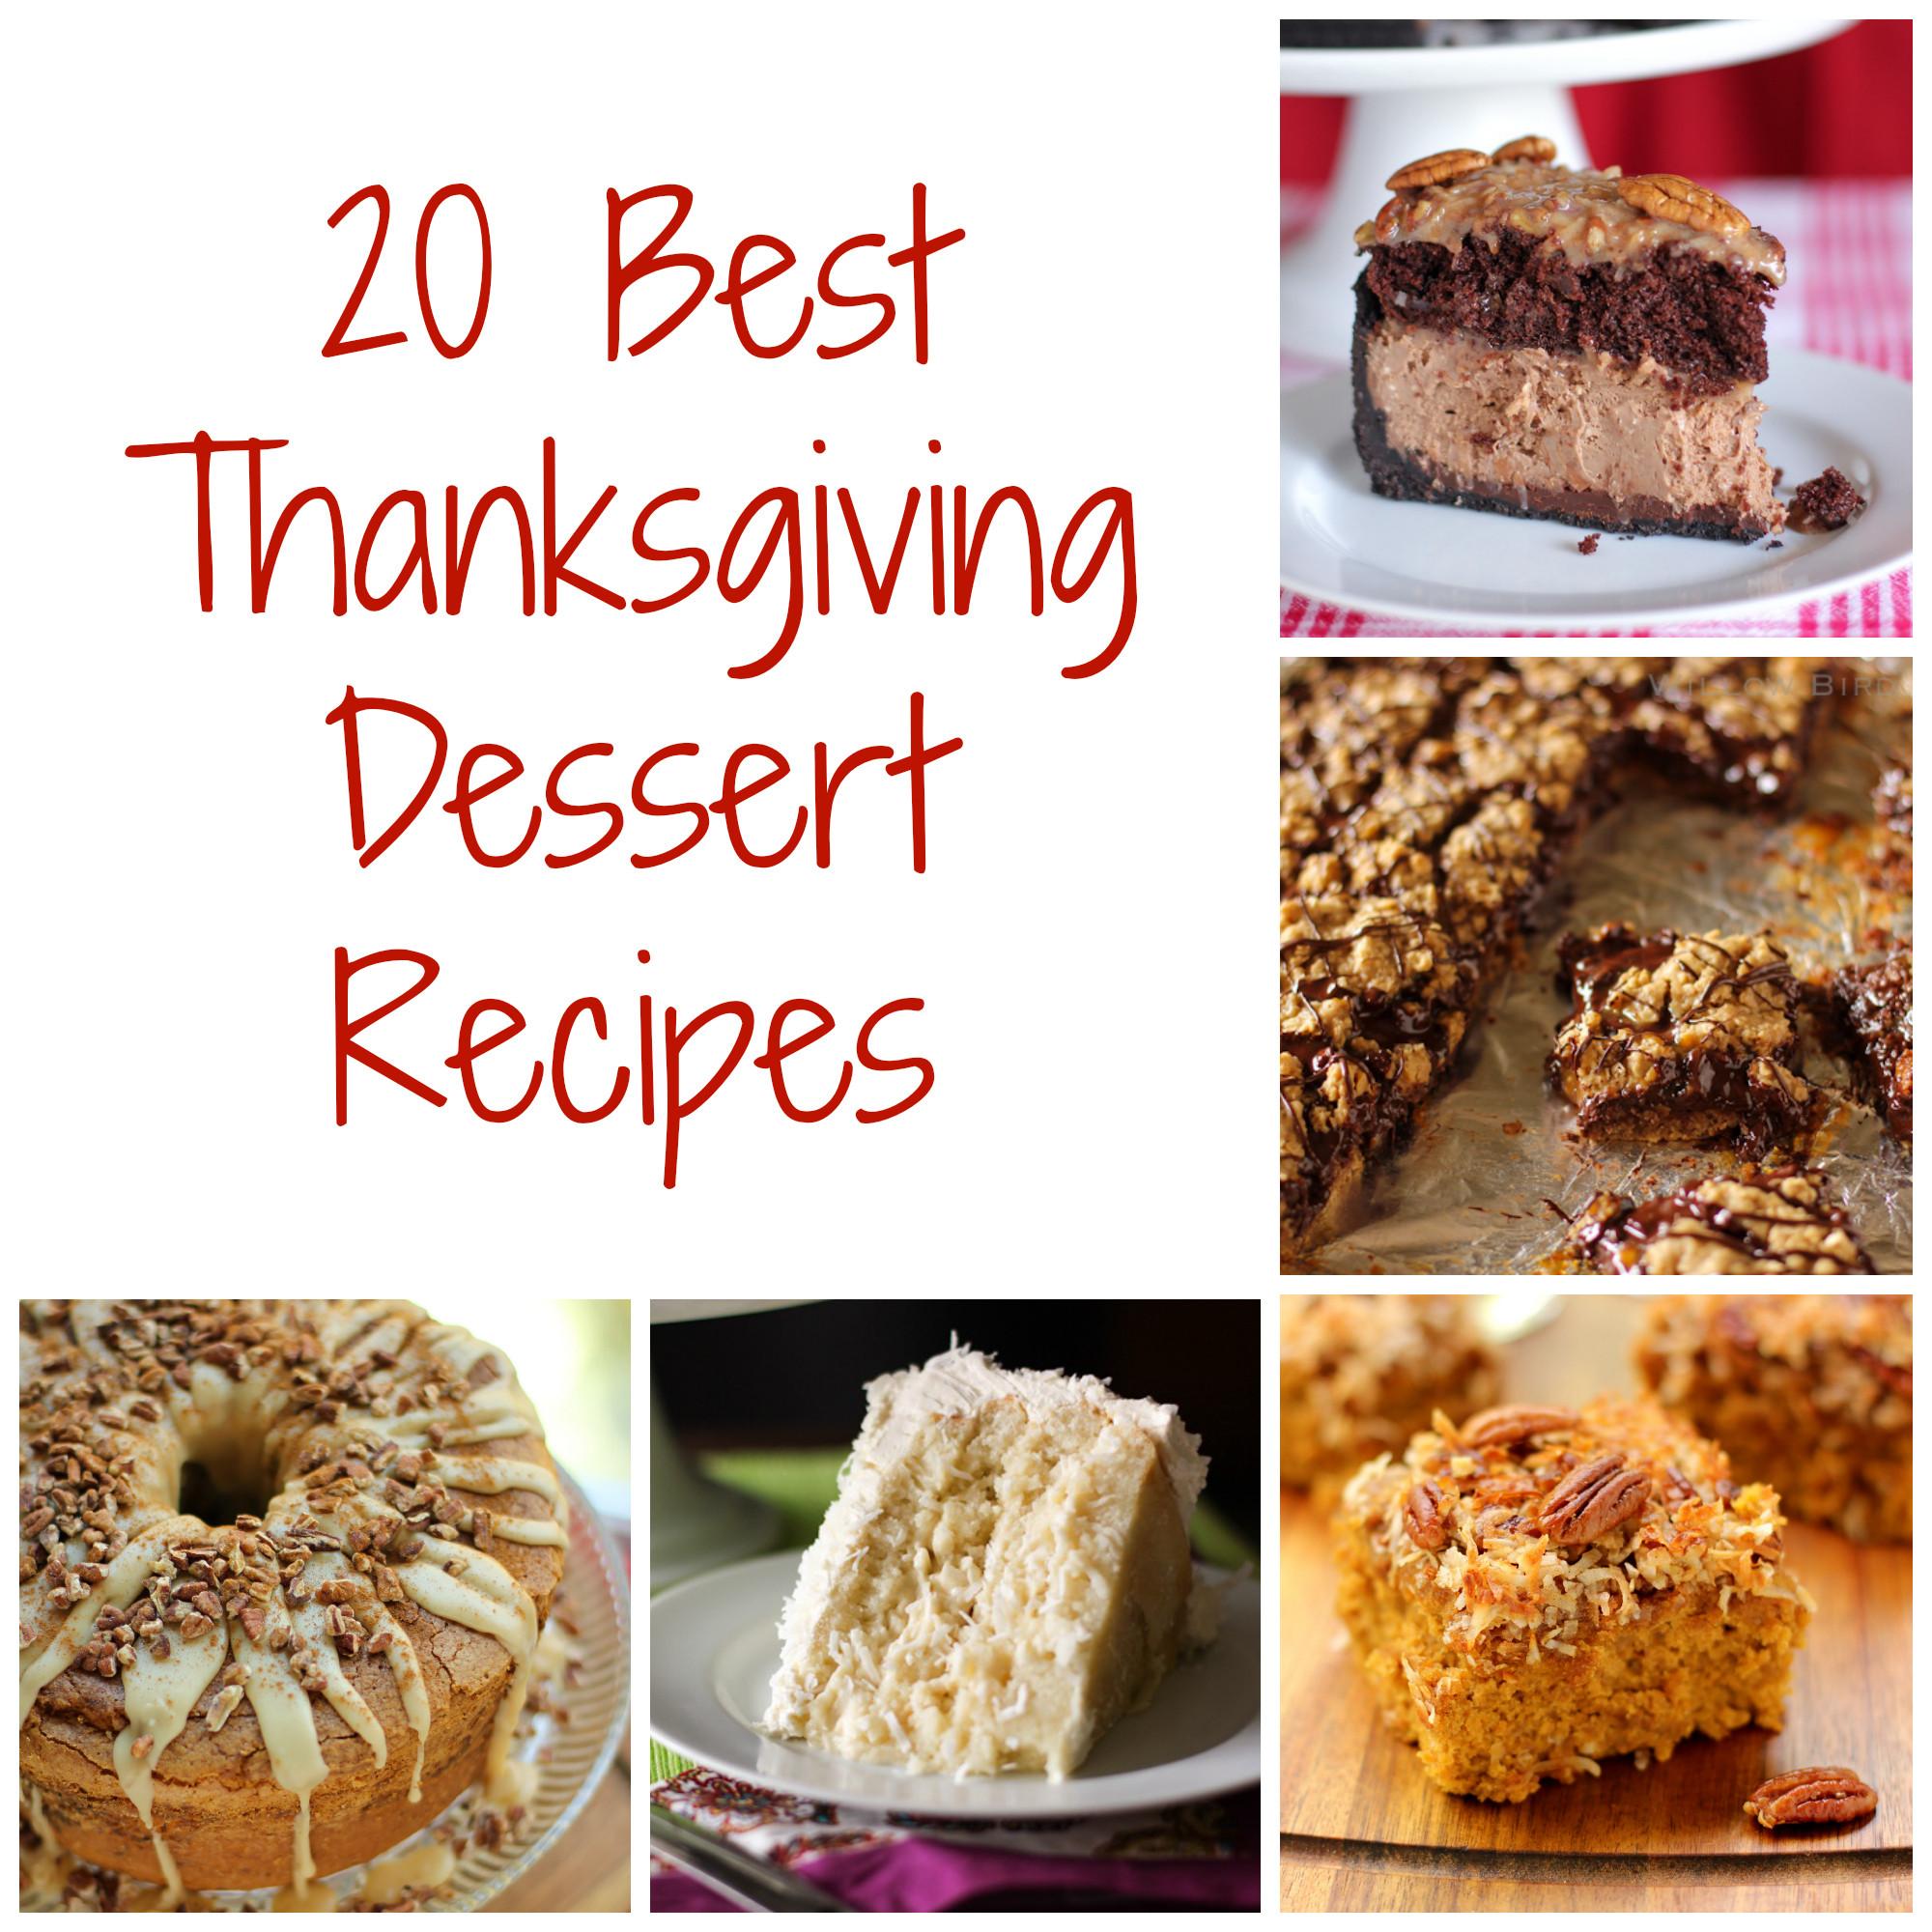 Thanksgiving Desserts Pictures  Thanksgiving Dessert Recipes Willow Bird Baking